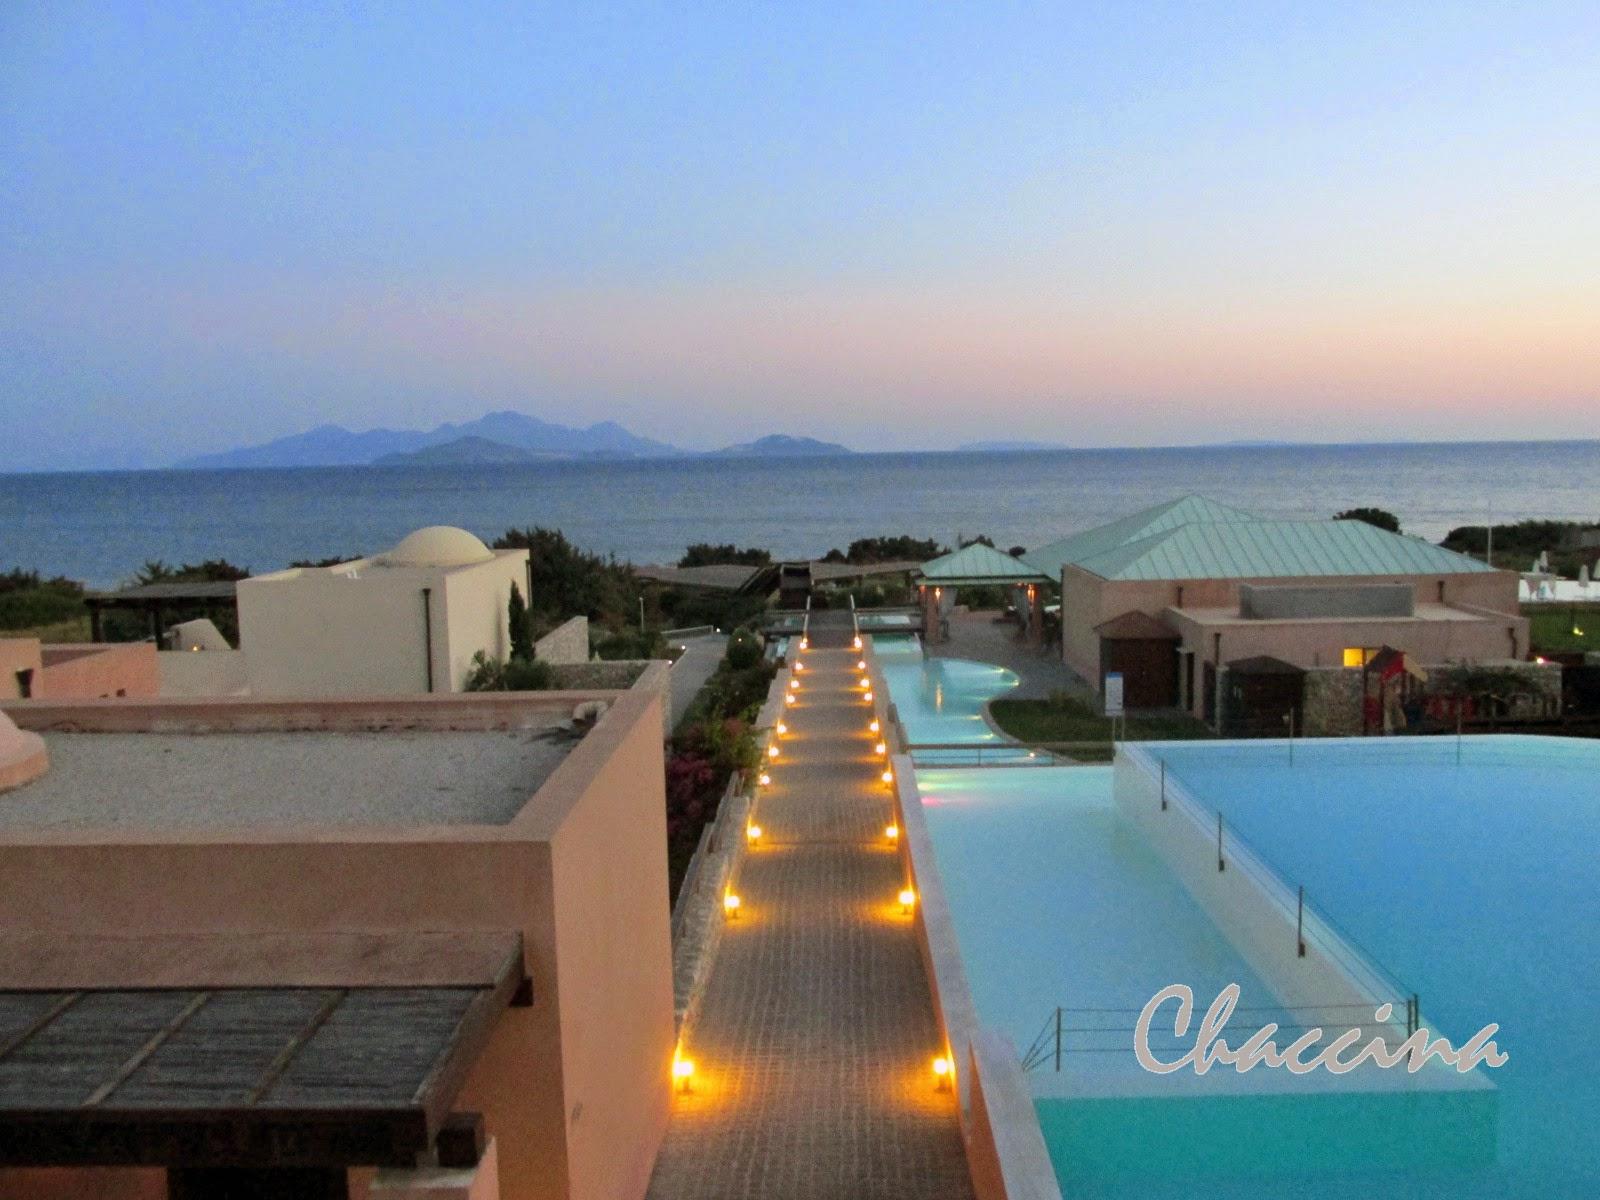 Das Hotel Helona-Resort auf Kos / Chaccina Lifestyleblog